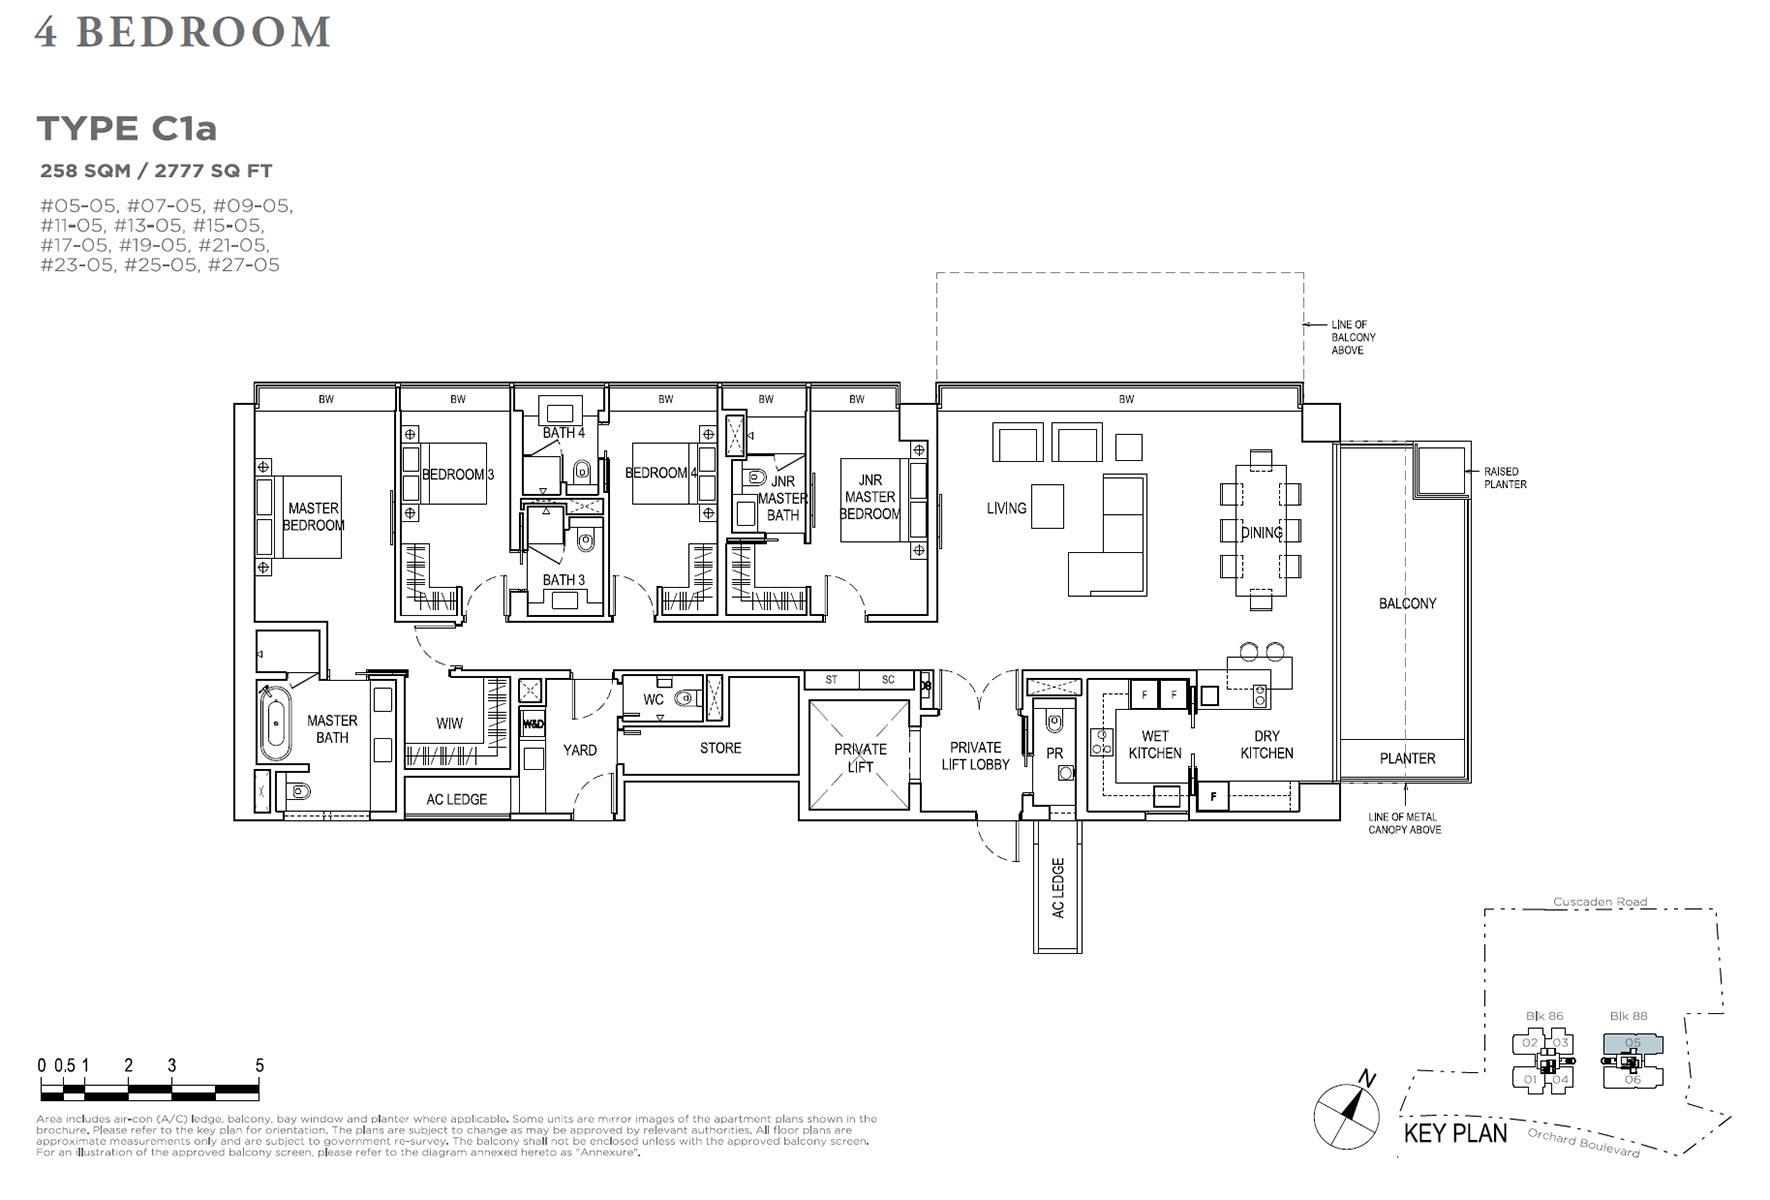 Boulevard 88 - 4 Bedroom C1a